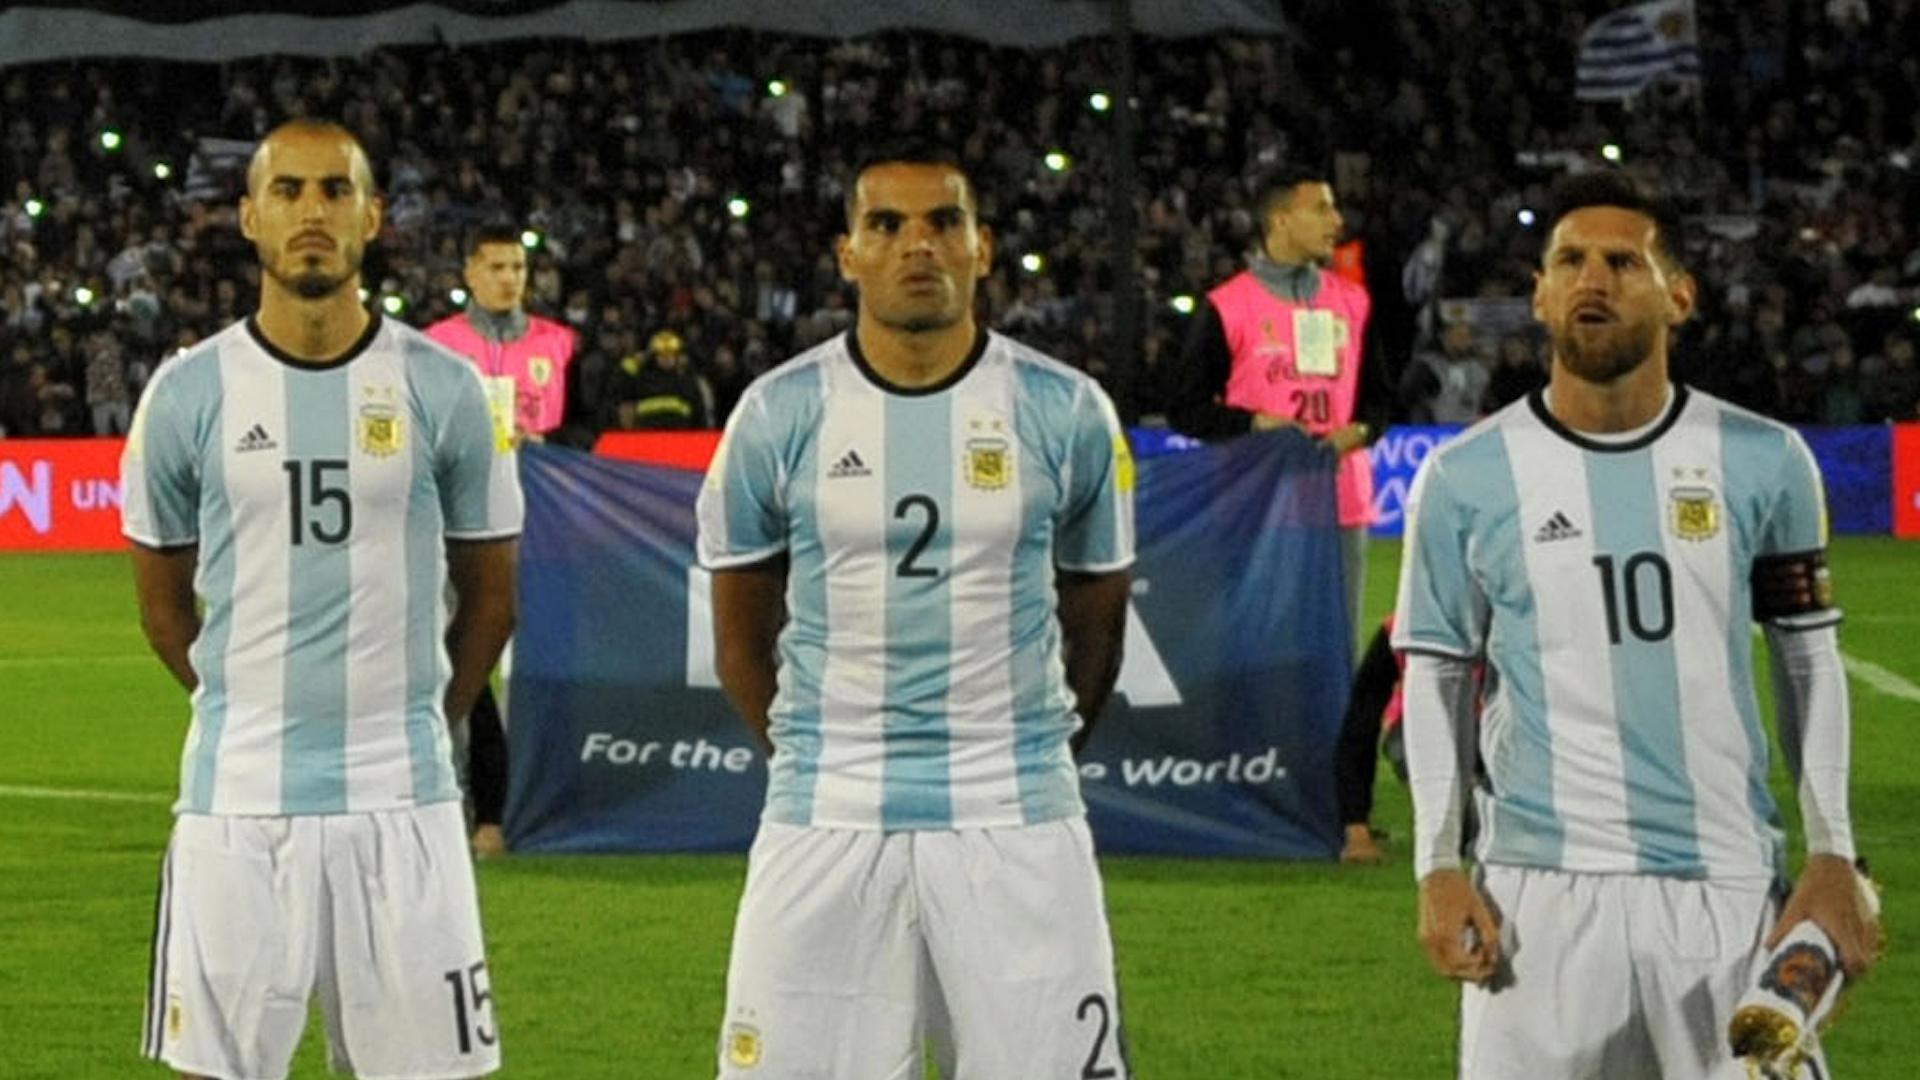 Mercado Pizarro Messi Argentina